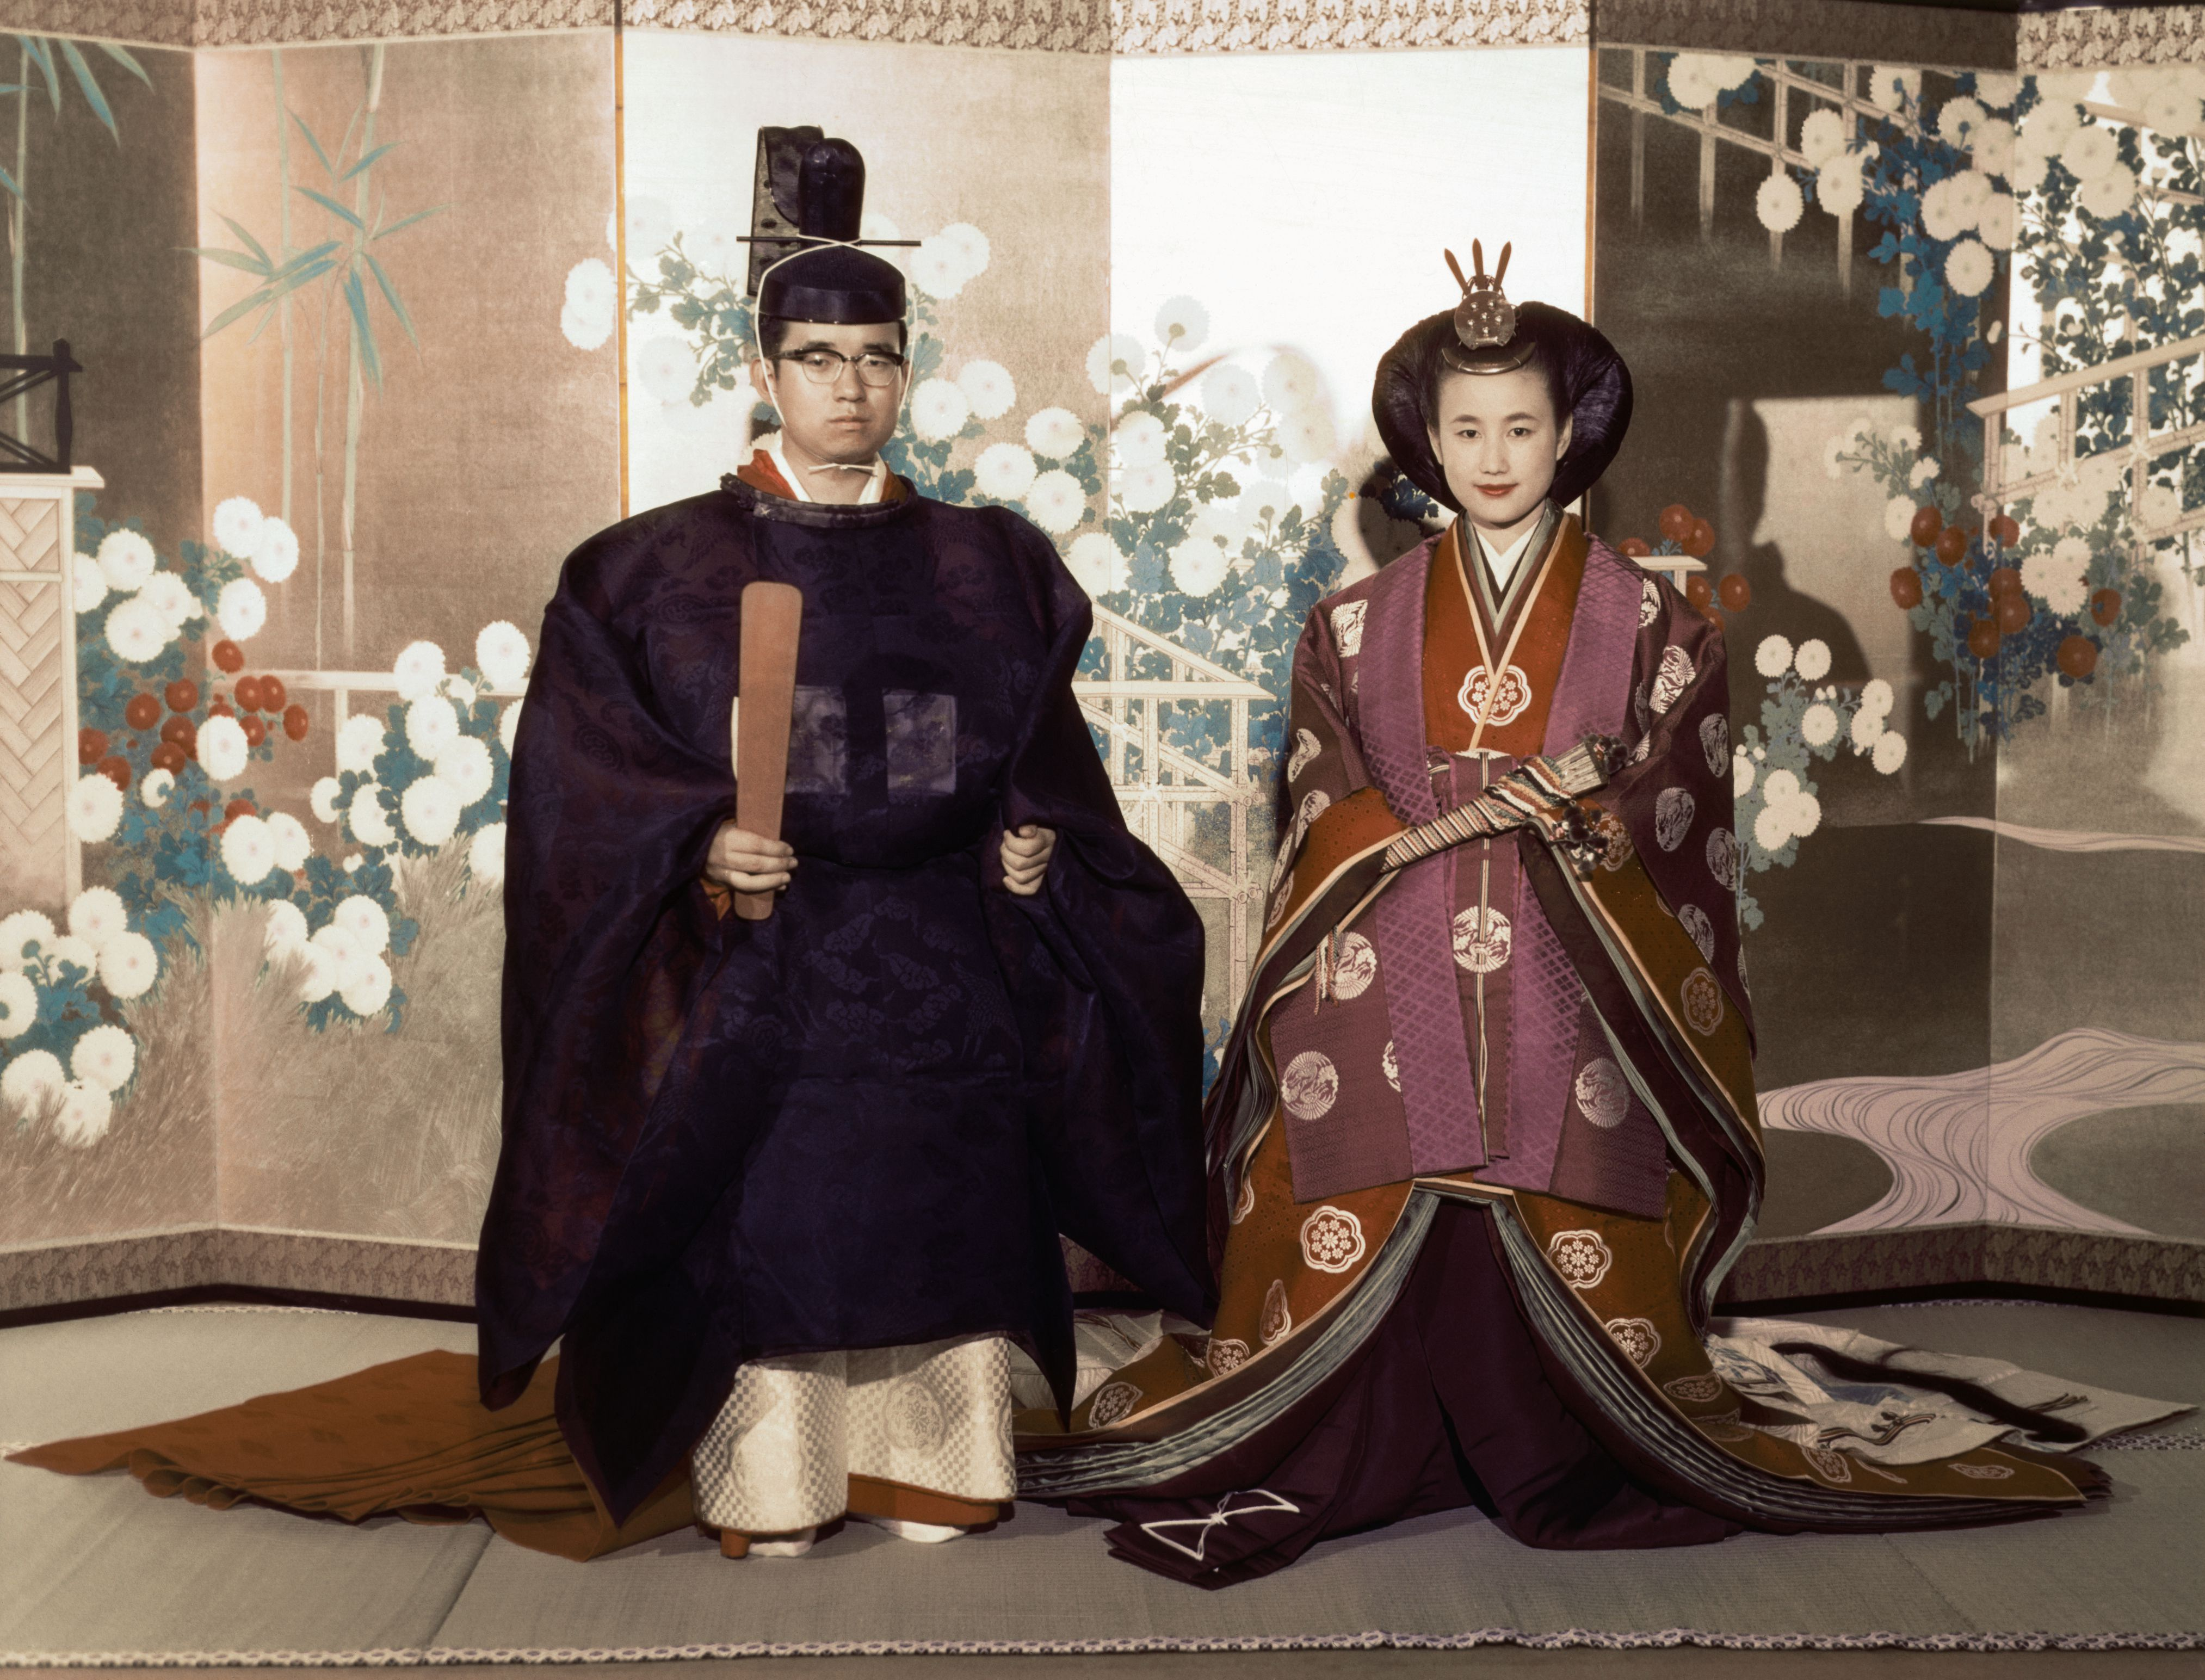 Prince and Princess Hitachi Wearing Traditional Japanese Wedding Attire